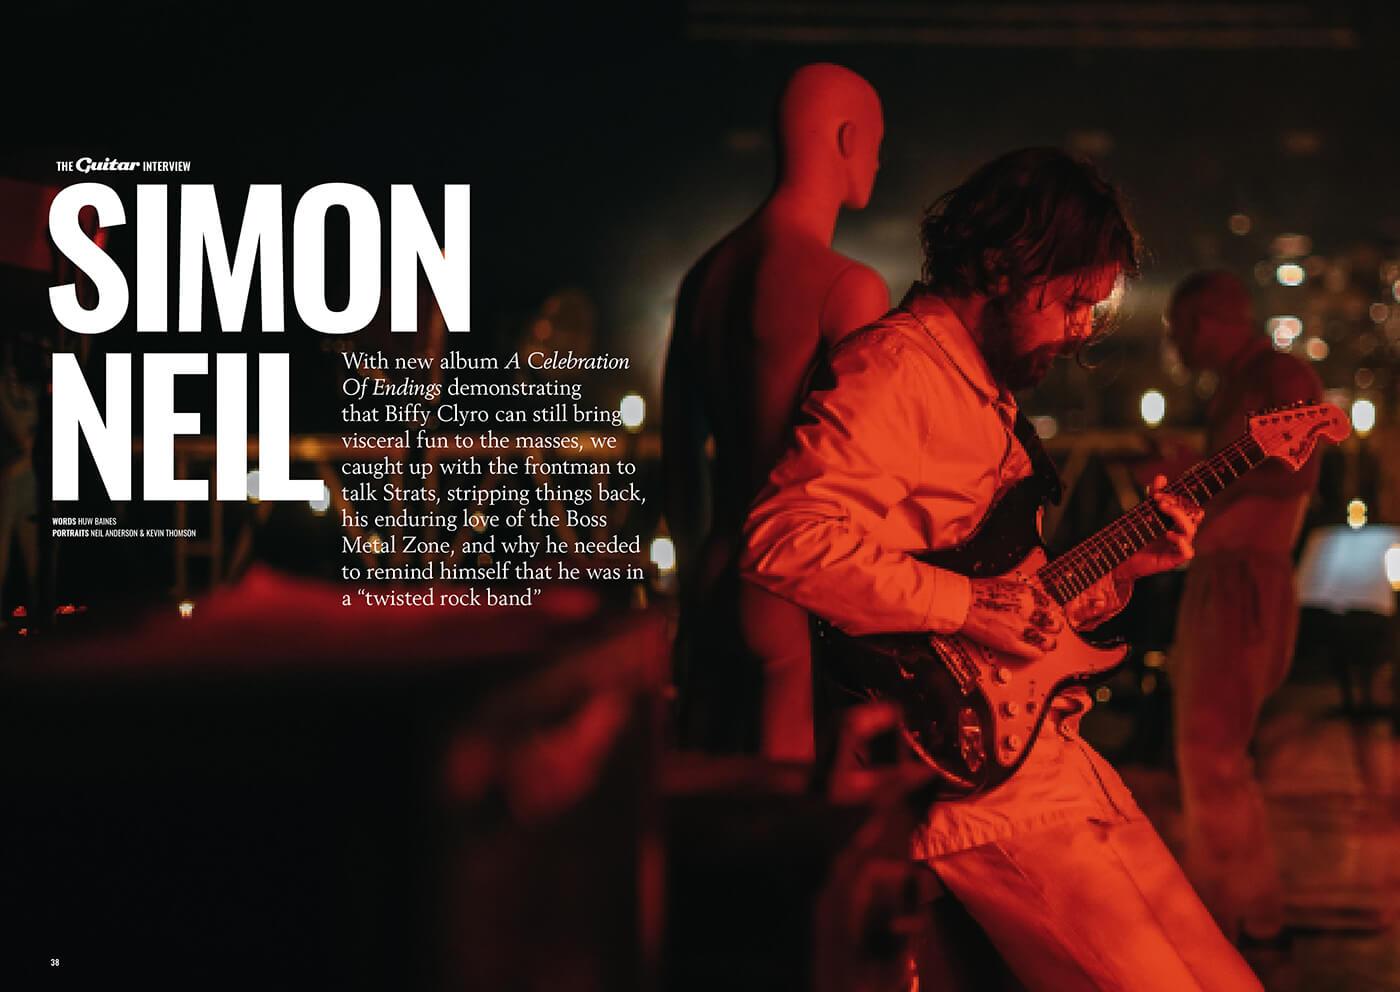 Simon Neil GM385